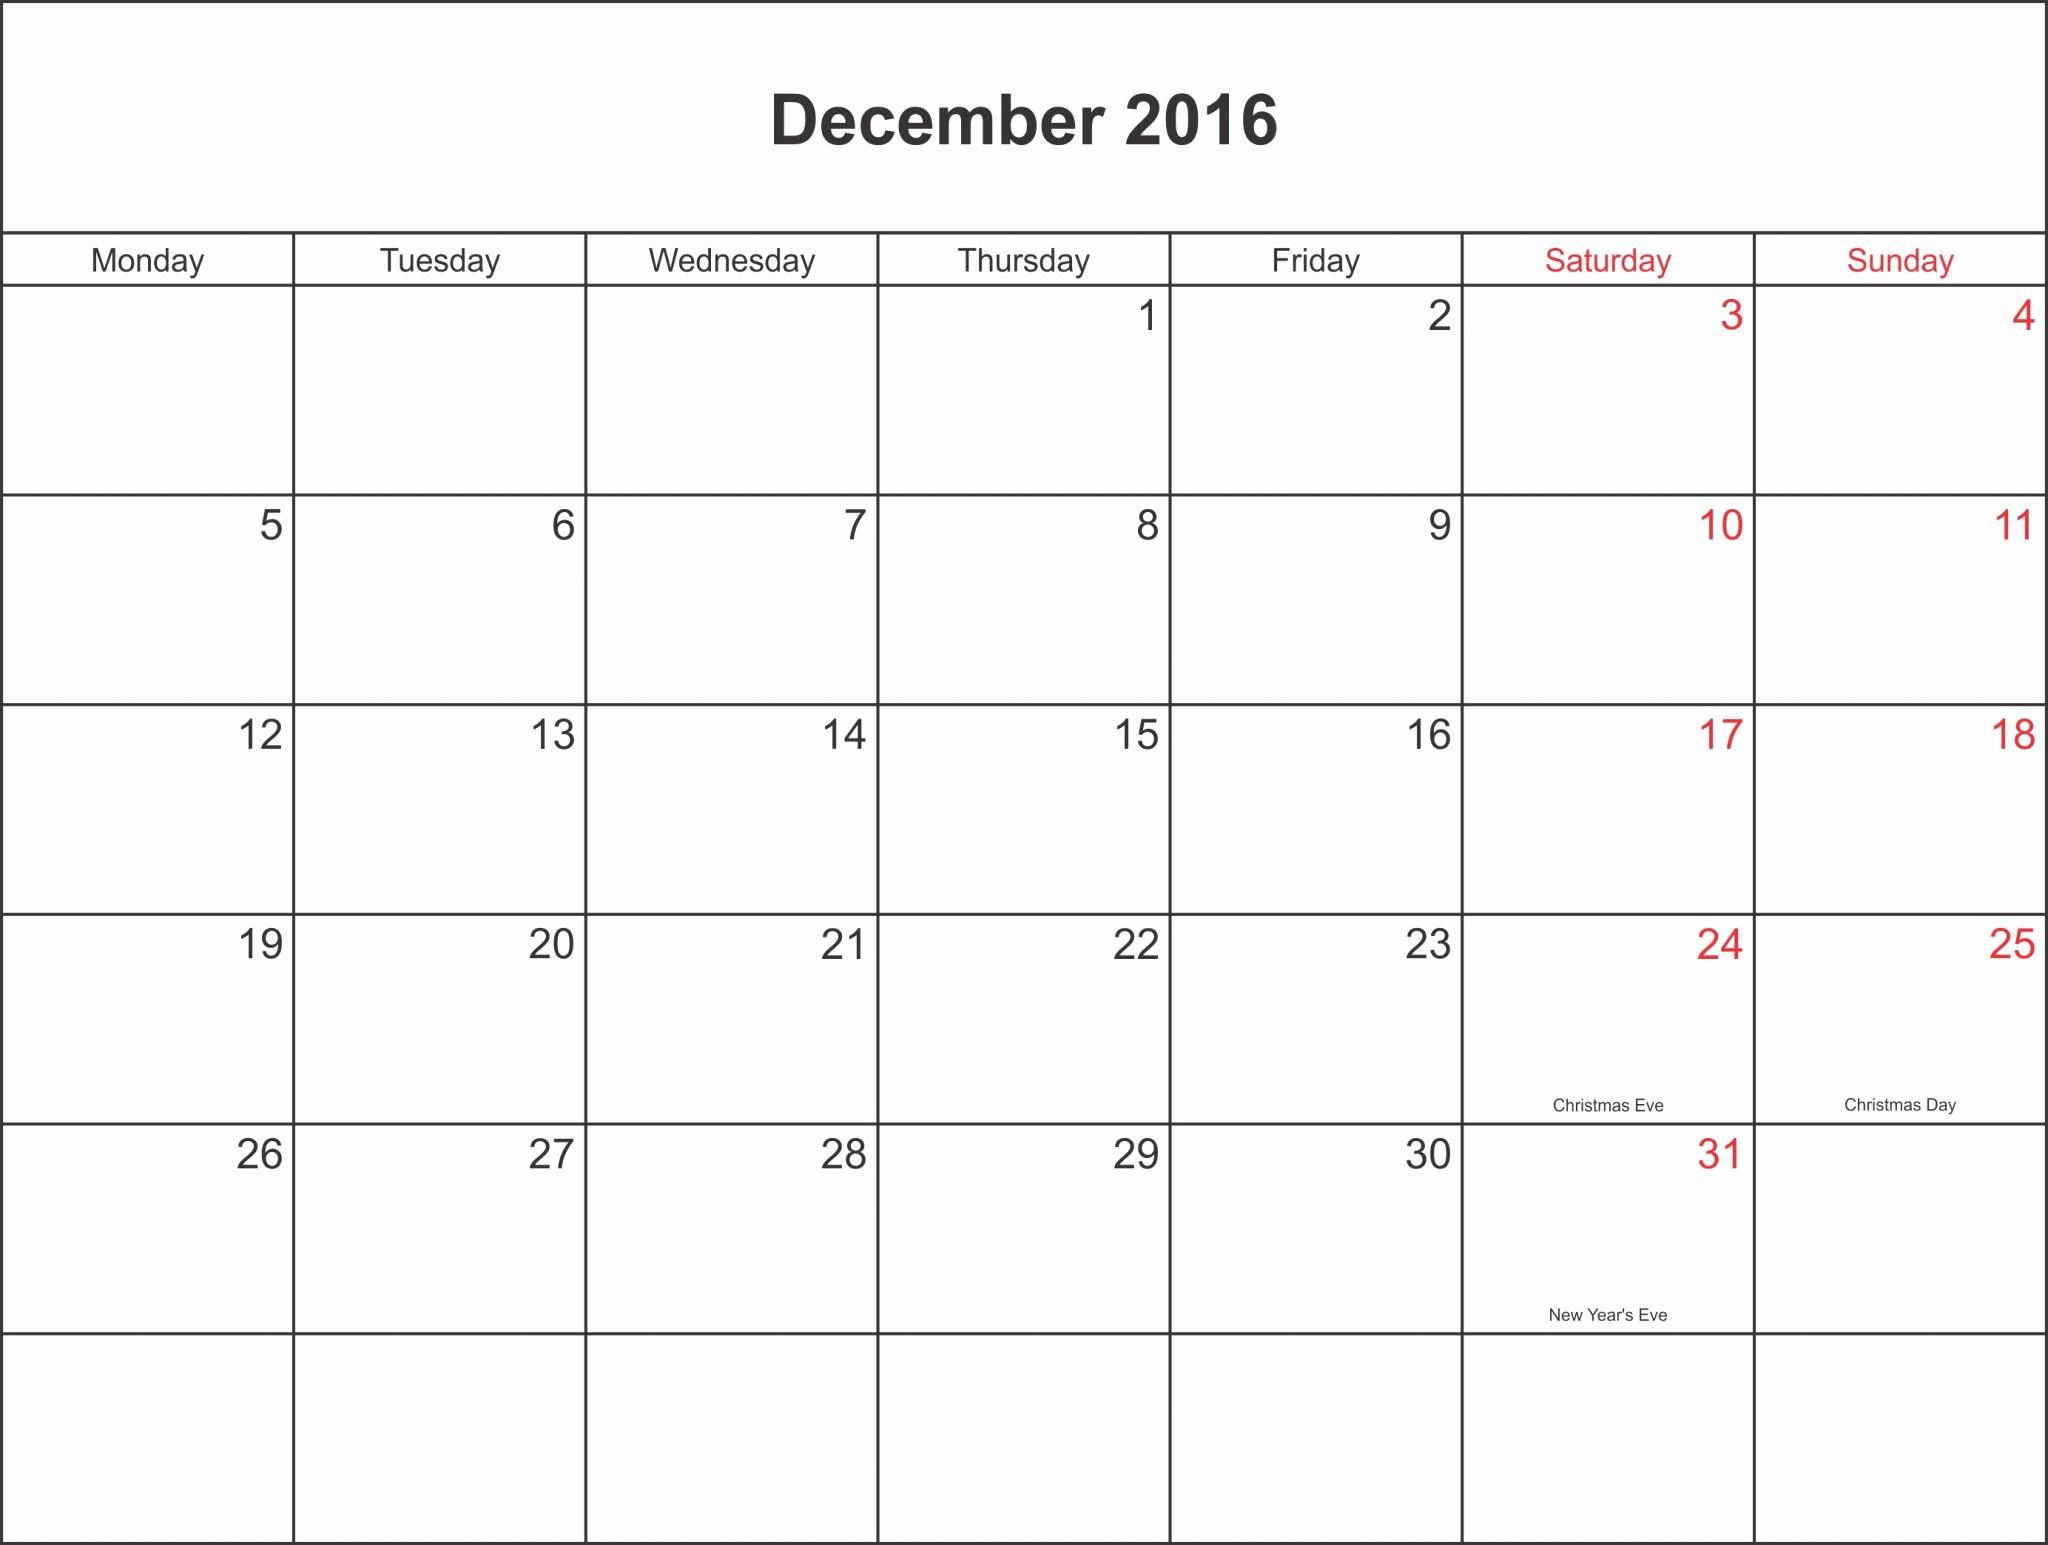 Blank December Calendar 2016 Printable Inspirational Blank December Calendar Templates 2016 Printable Word Pdf